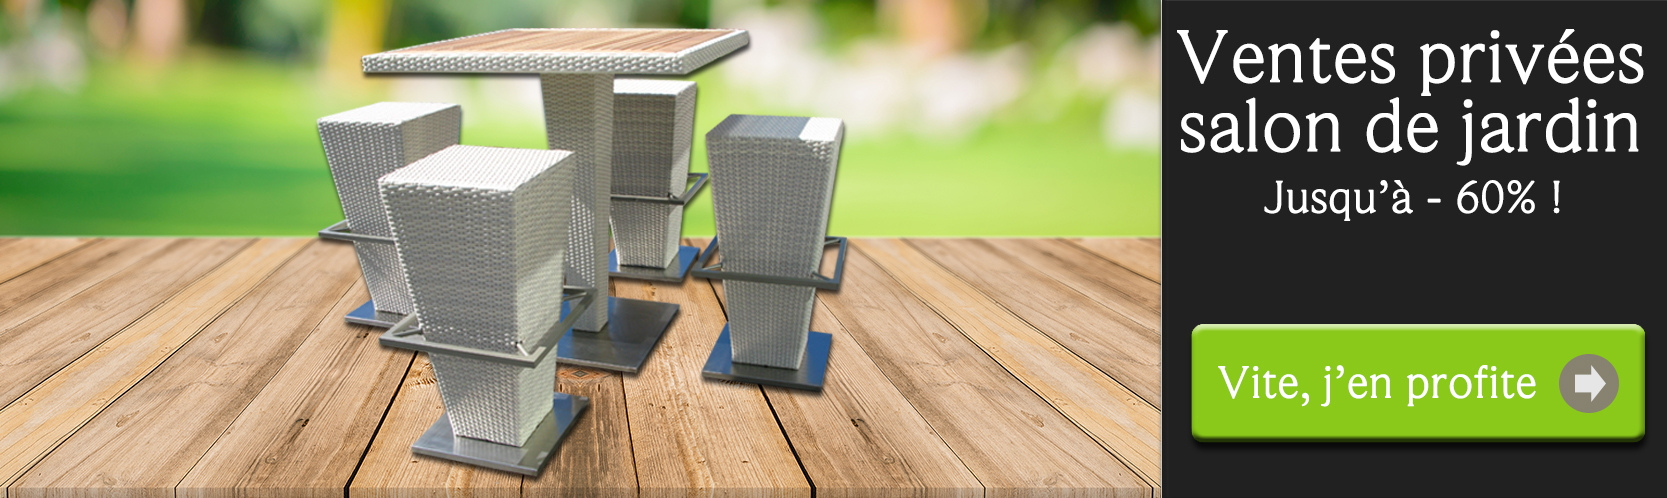 ventes privees almateon. Black Bedroom Furniture Sets. Home Design Ideas